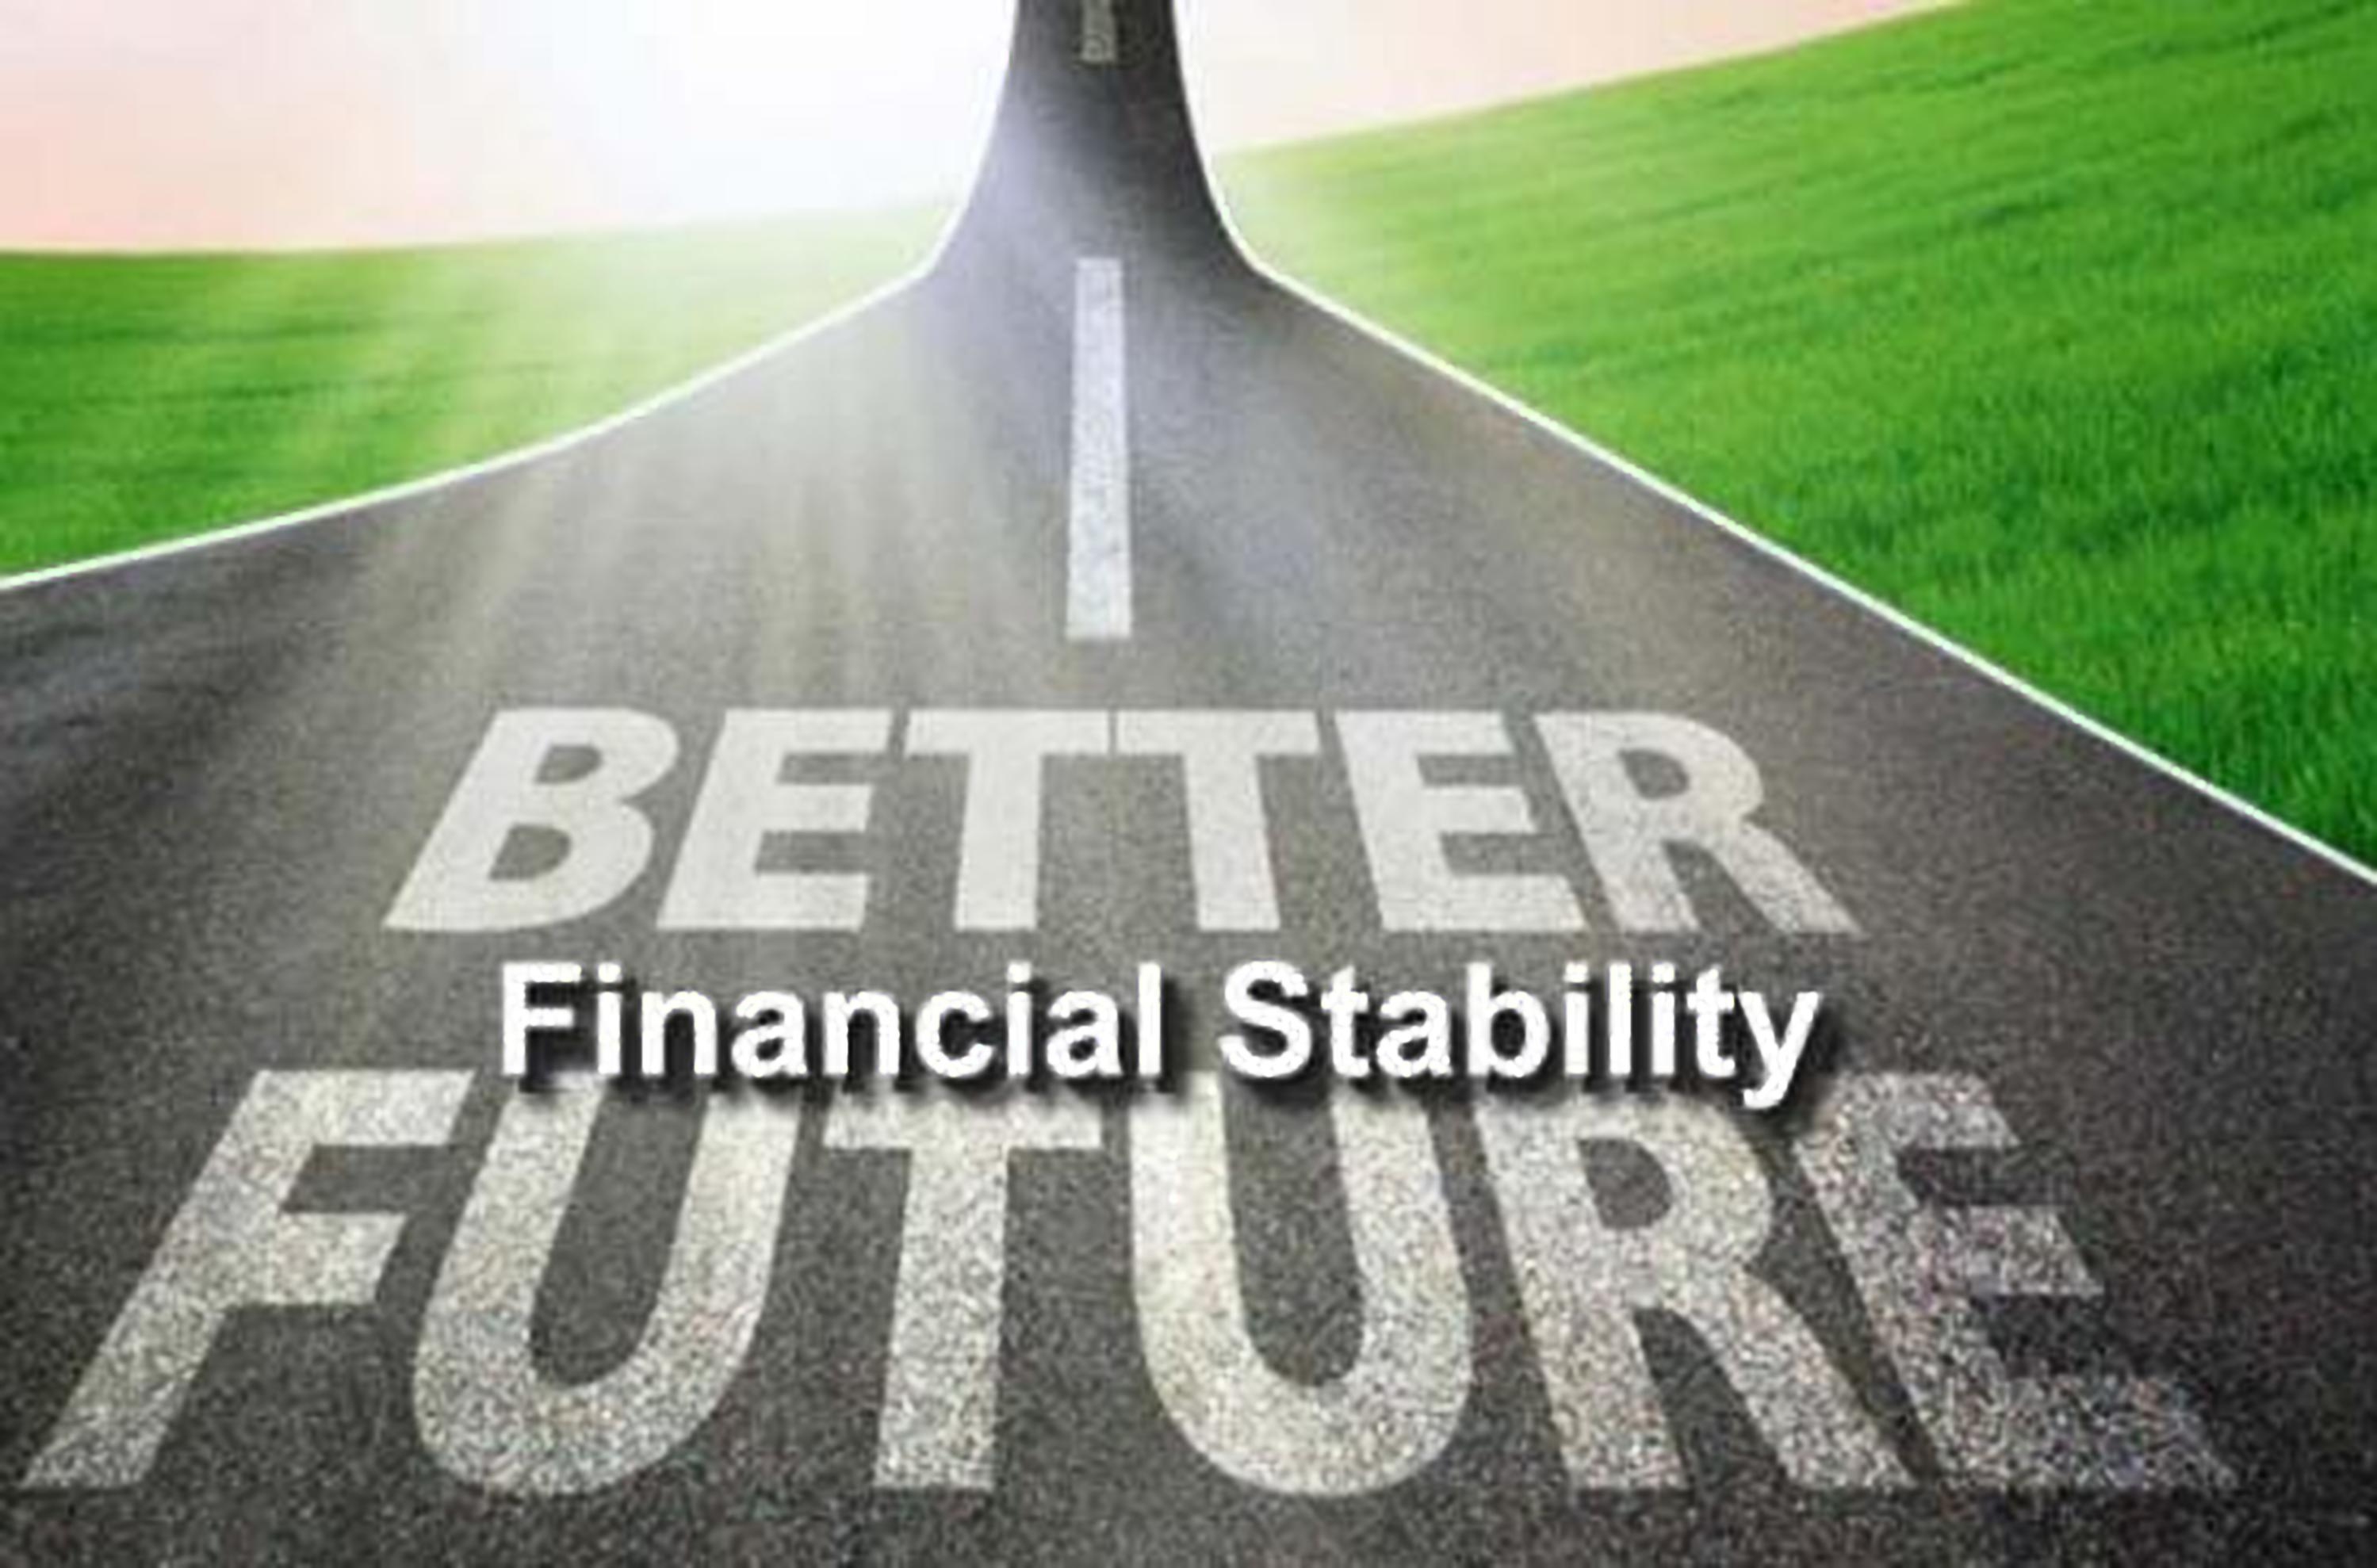 Photo of تحميل كتاب شرح الاستقرار المالي وكيفية تحقيق الاستقرار المالي financial stability مجانا